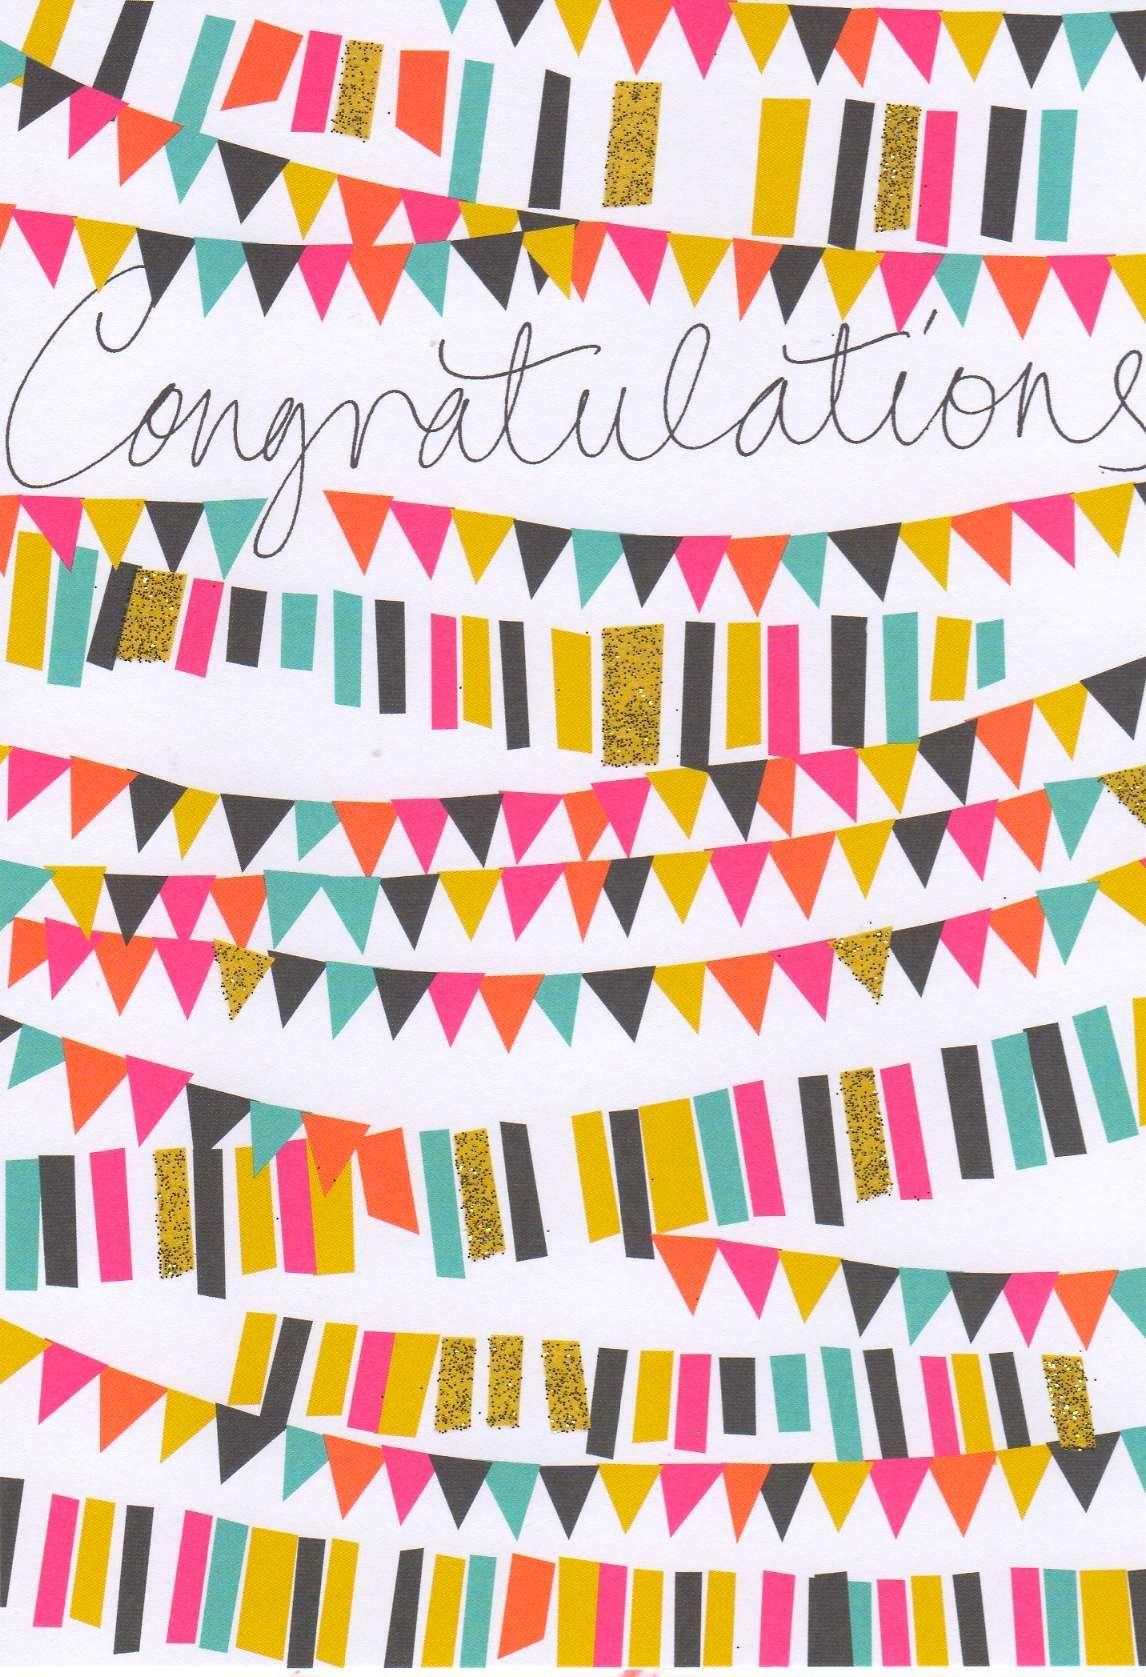 Congratulation Card - Banners | Congratulations | Cards ...